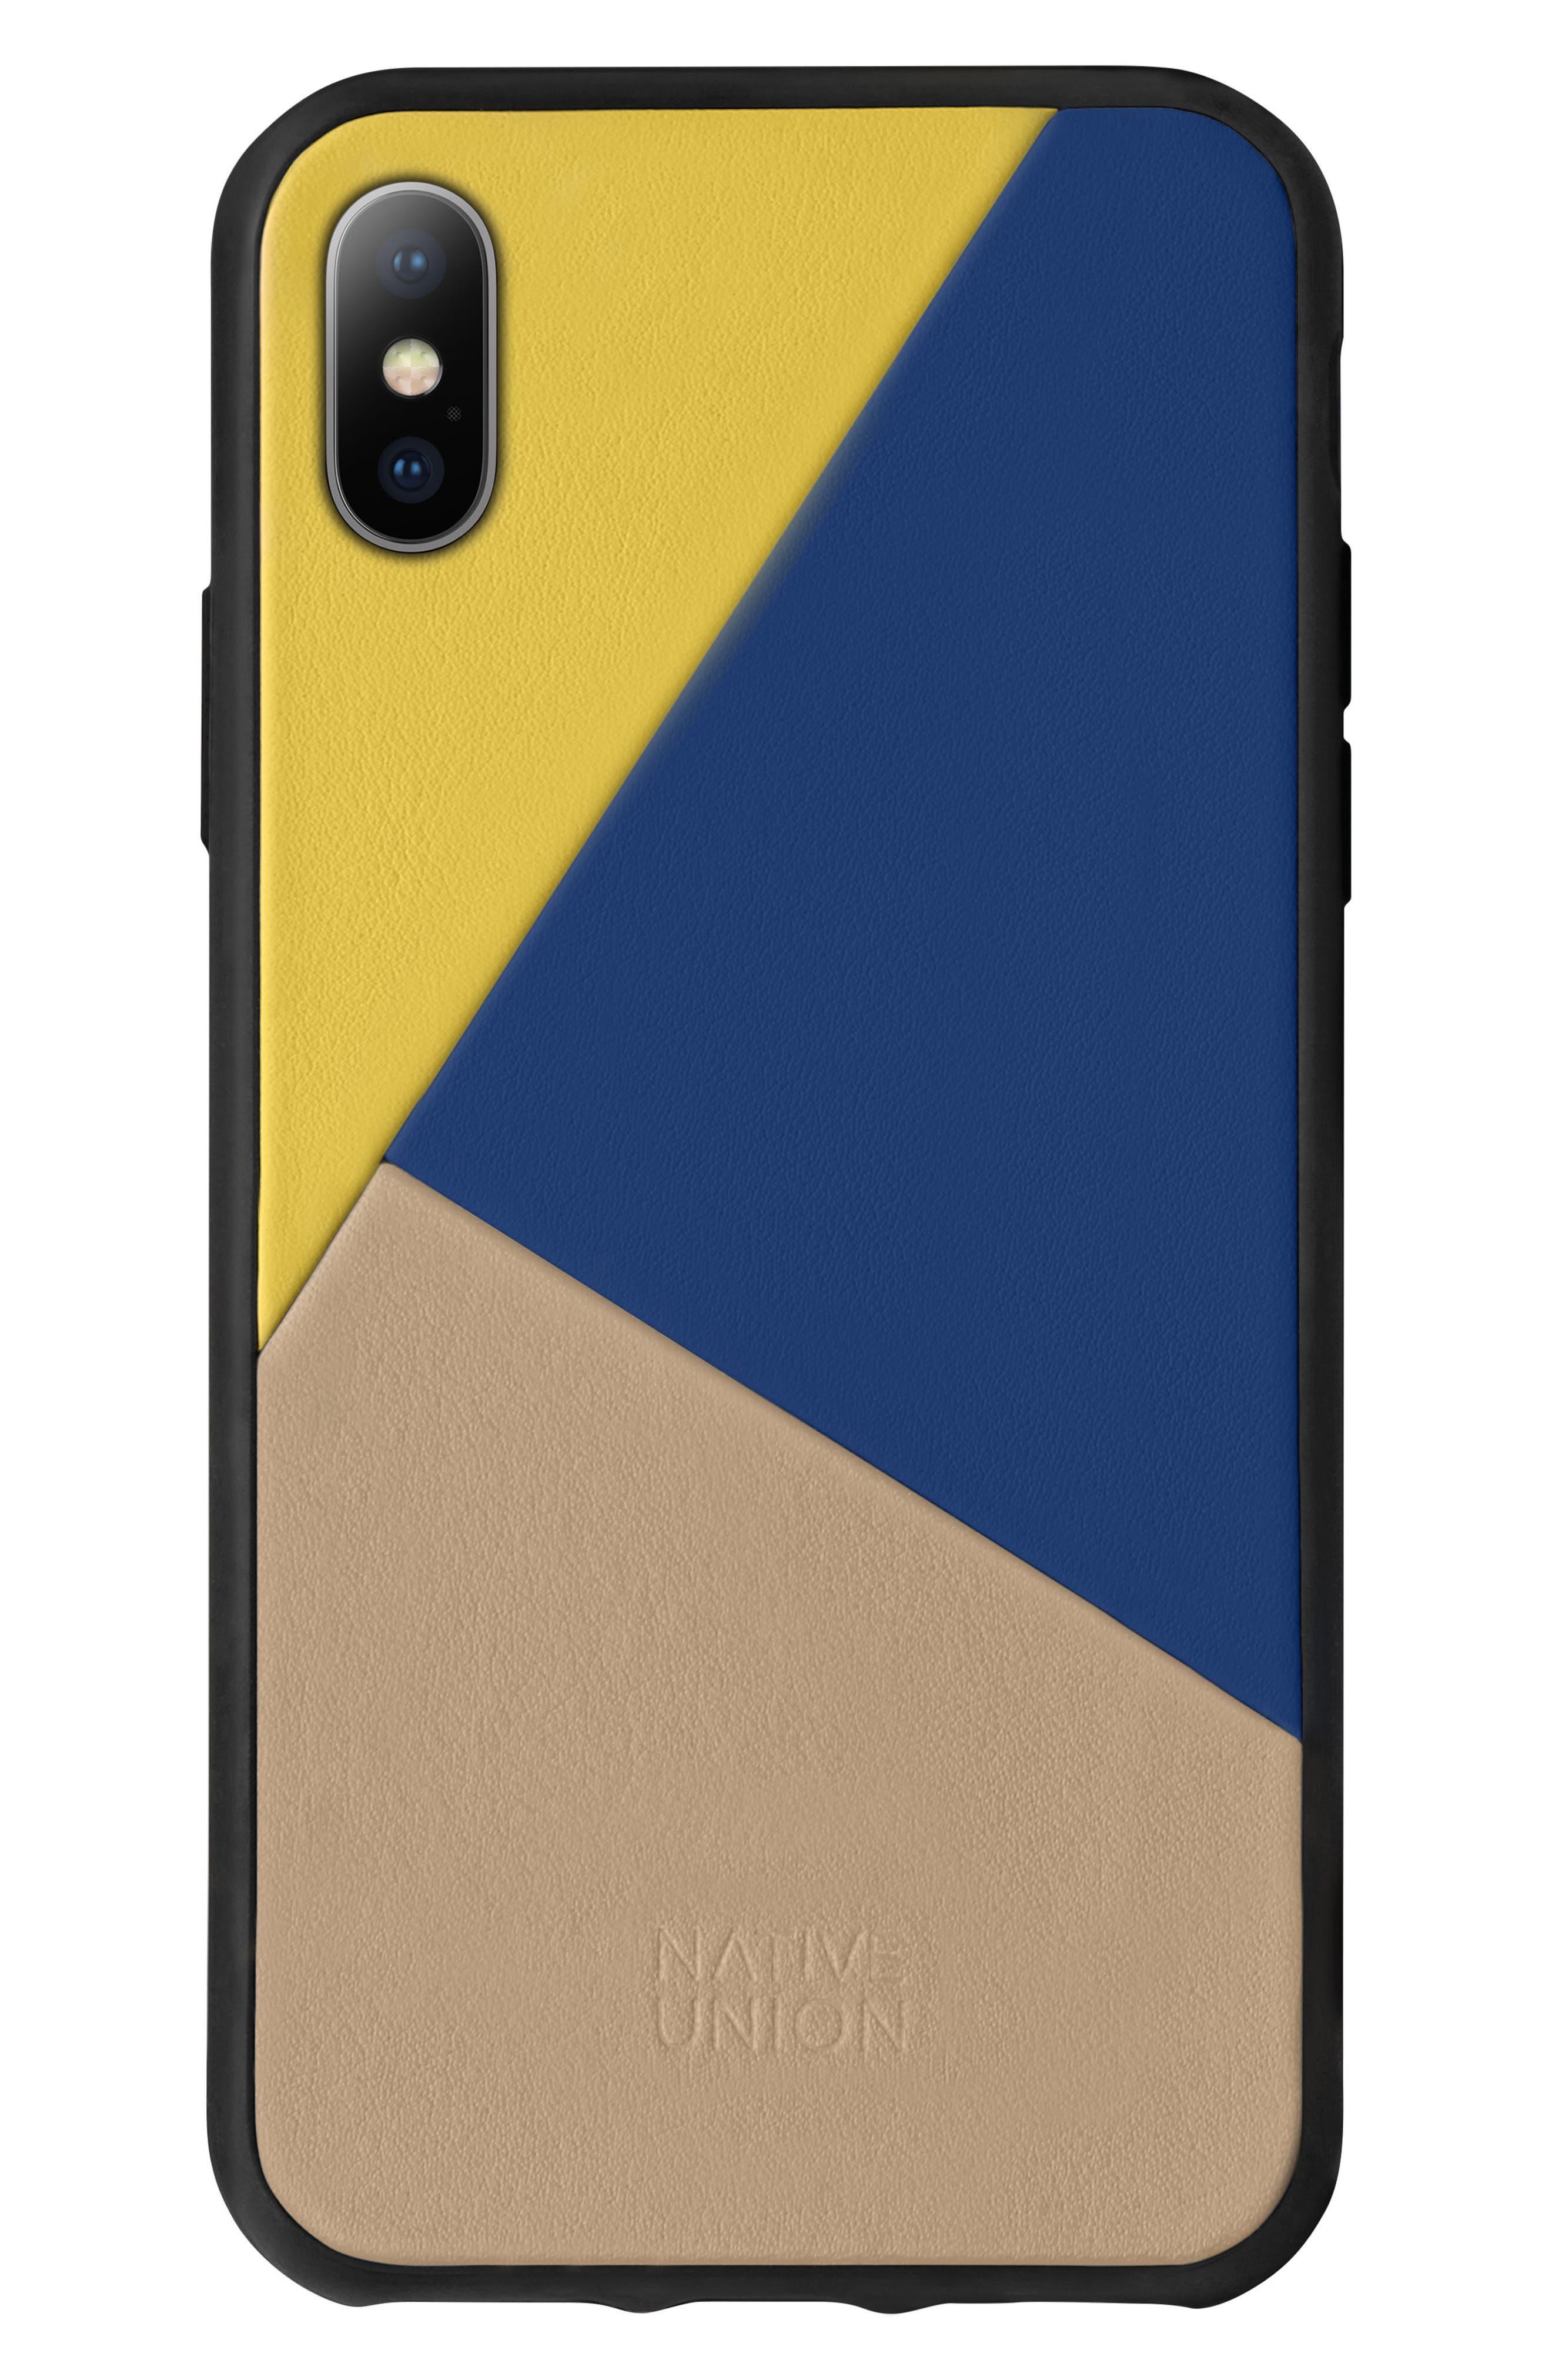 Native Union CLIC Leather iPhone X Case